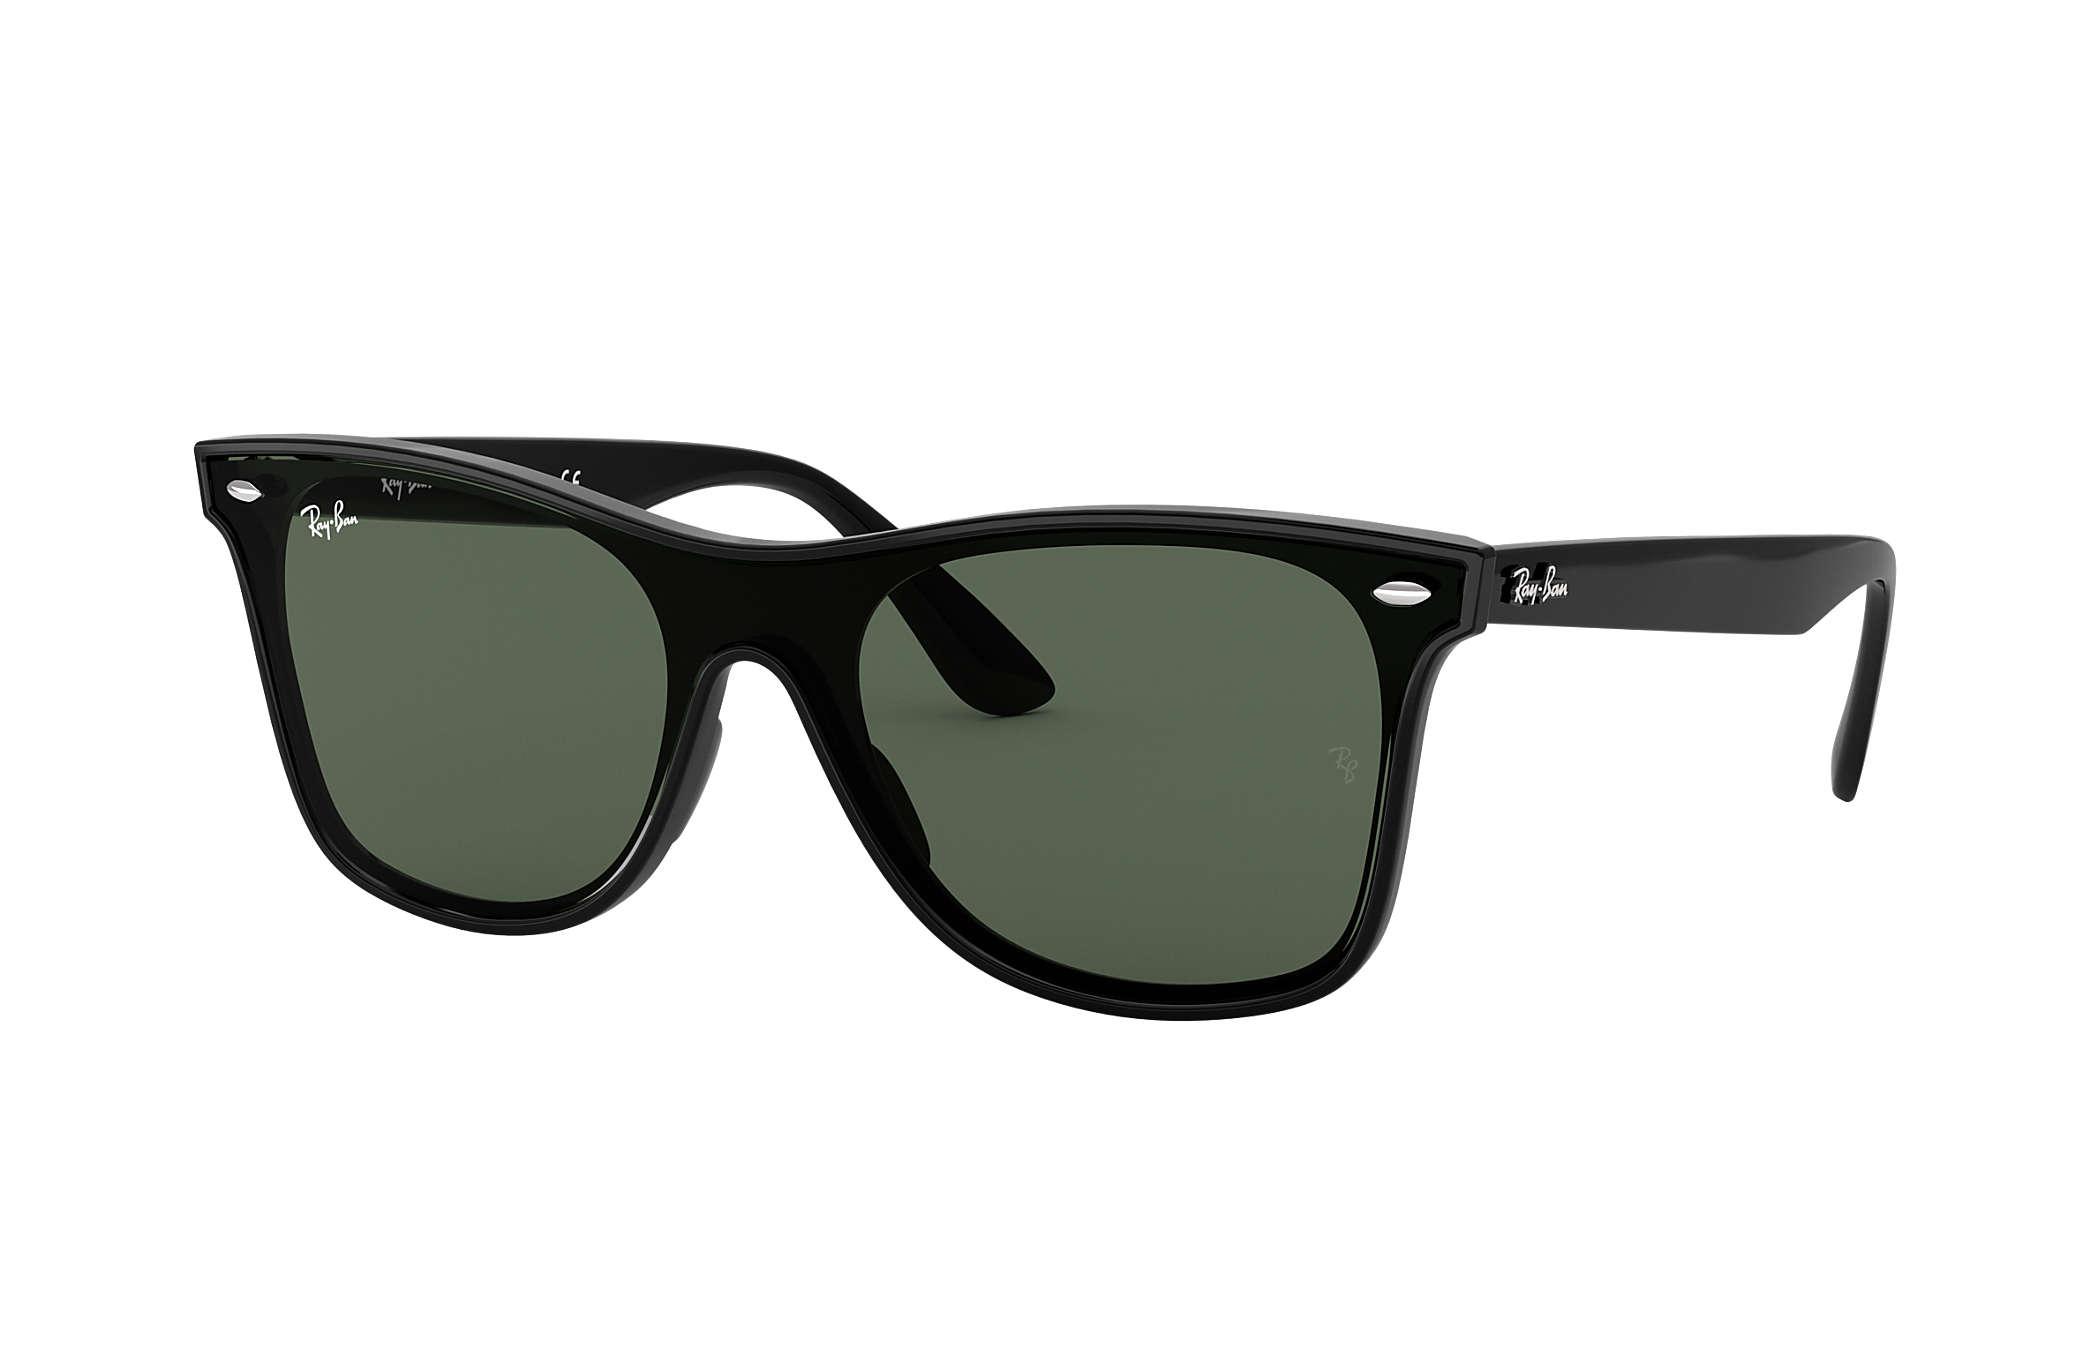 e8e4cc612e34 Ray-Ban Blaze Wayfarer RB4440N Black - Nylon - Green Lenses ...